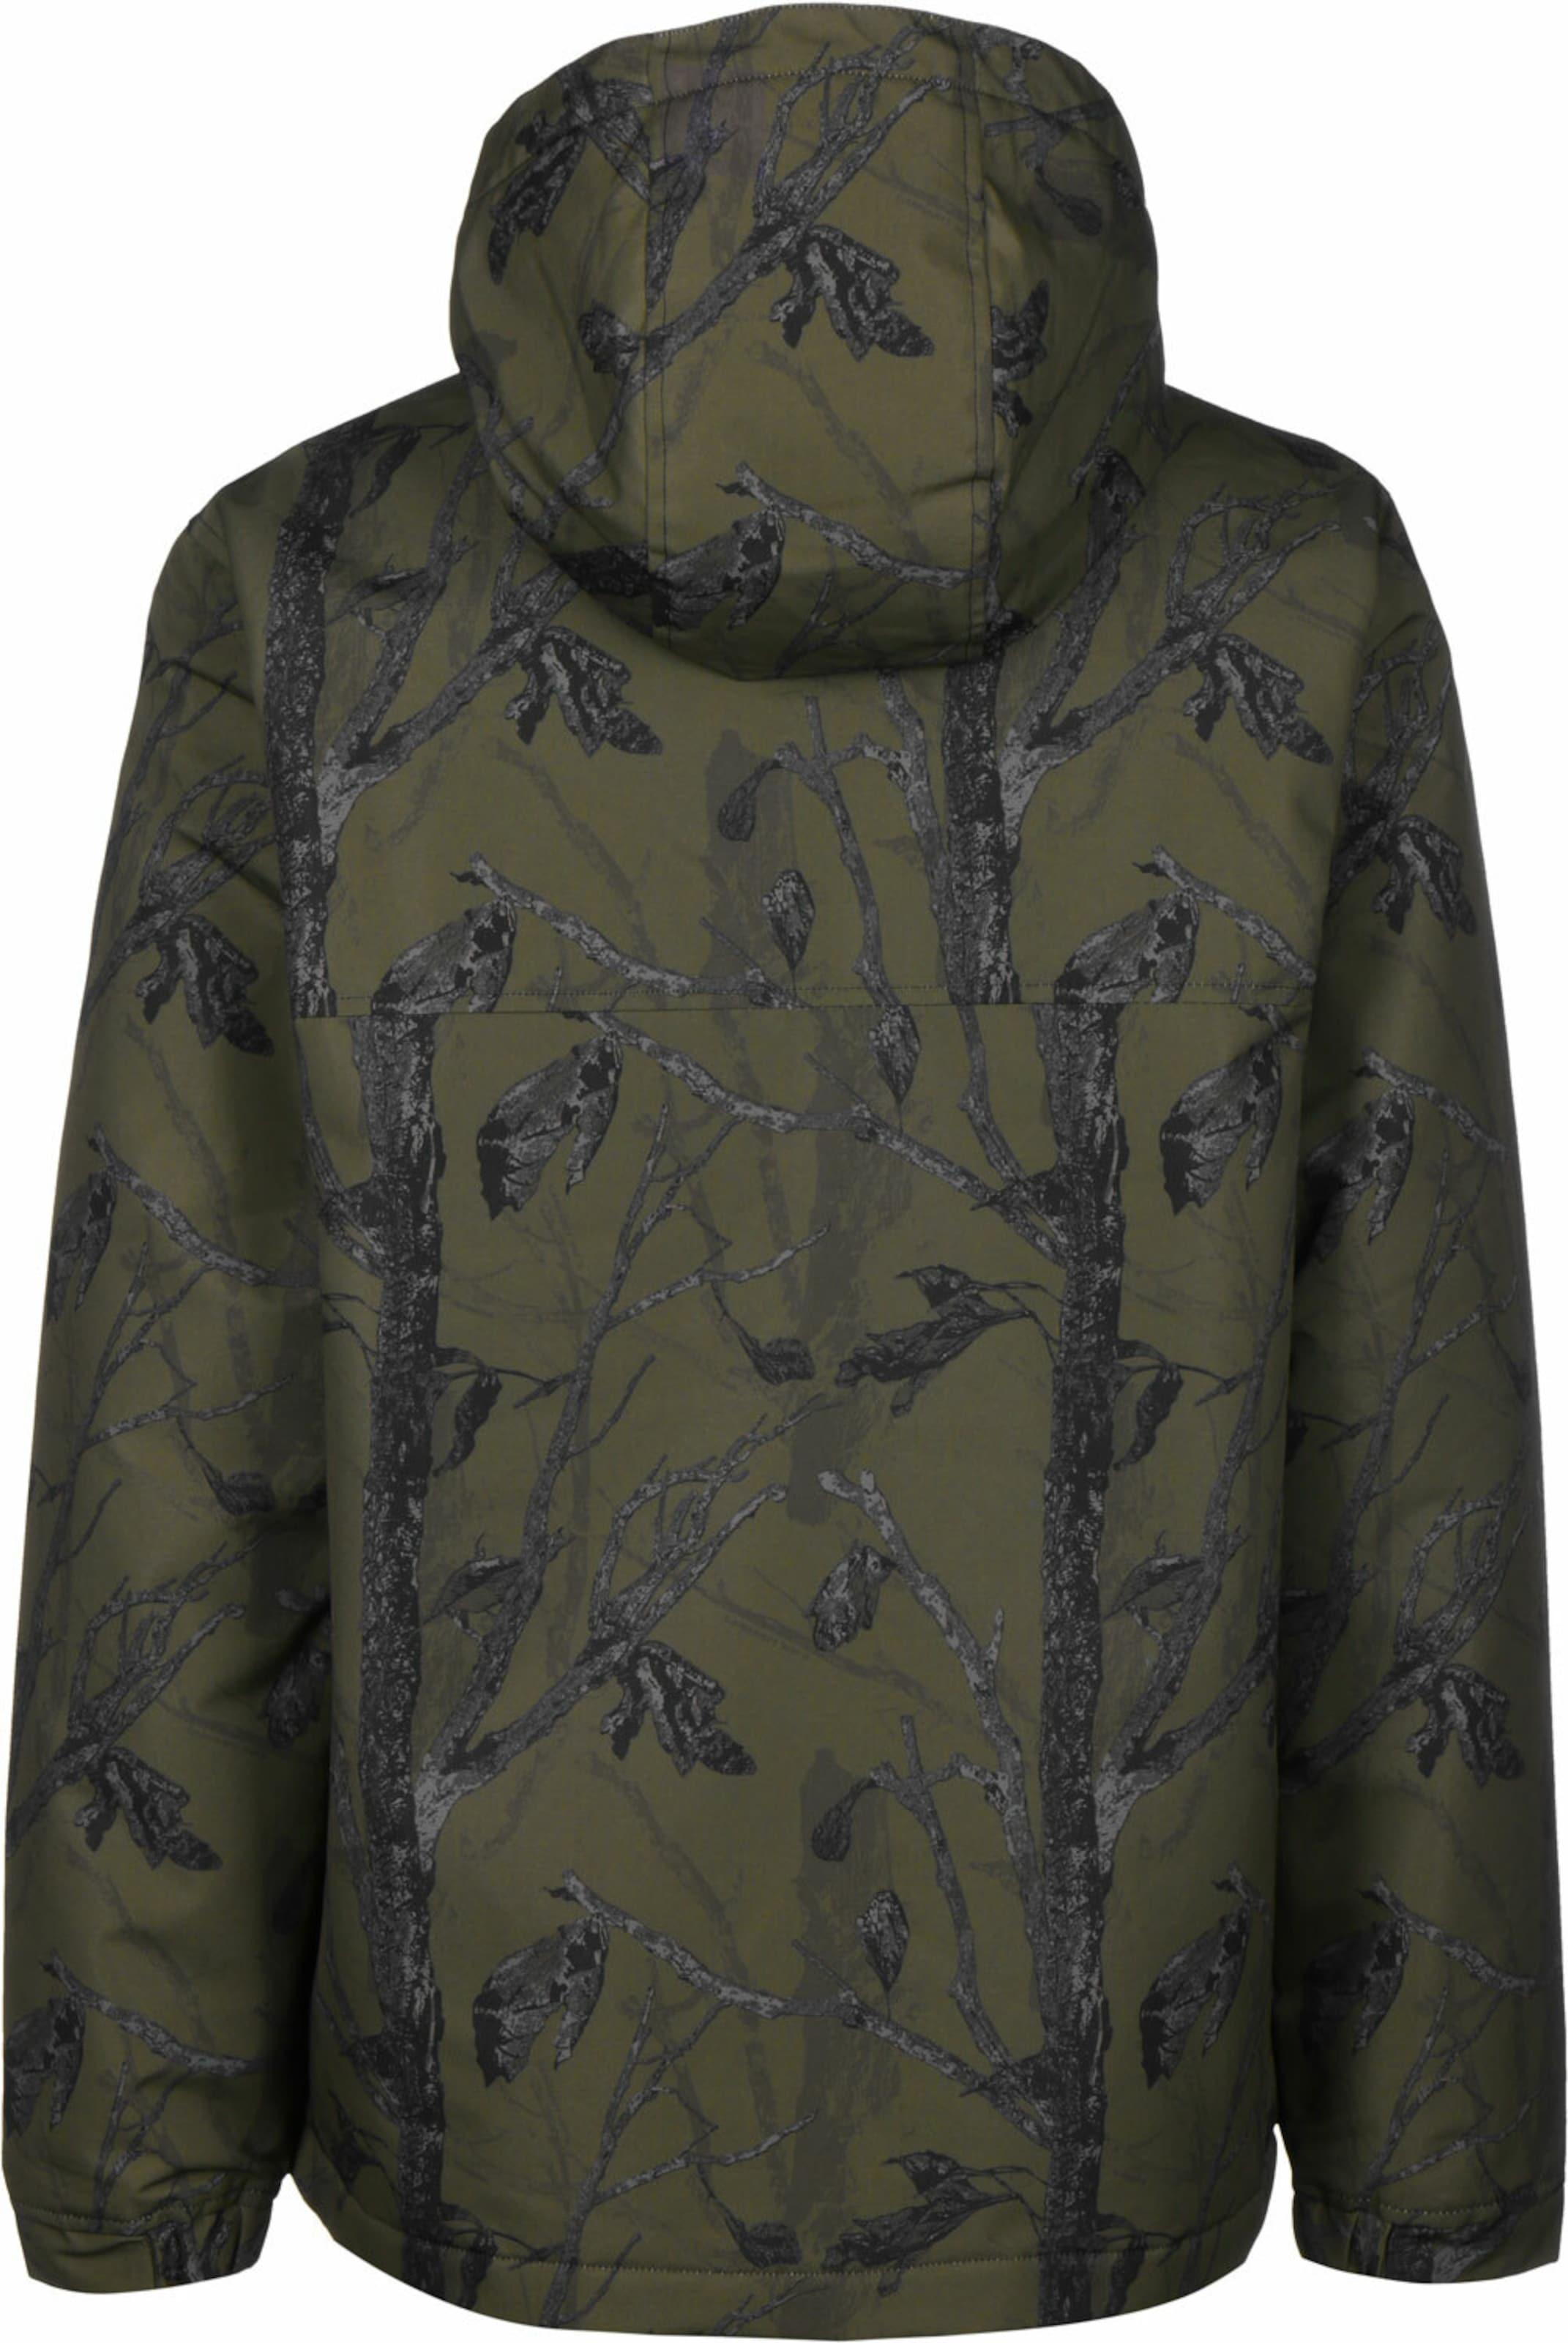 Carhartt WIP Winterjacke ' Nimbus ' in grün / schwarz Camouflage KJ54948250